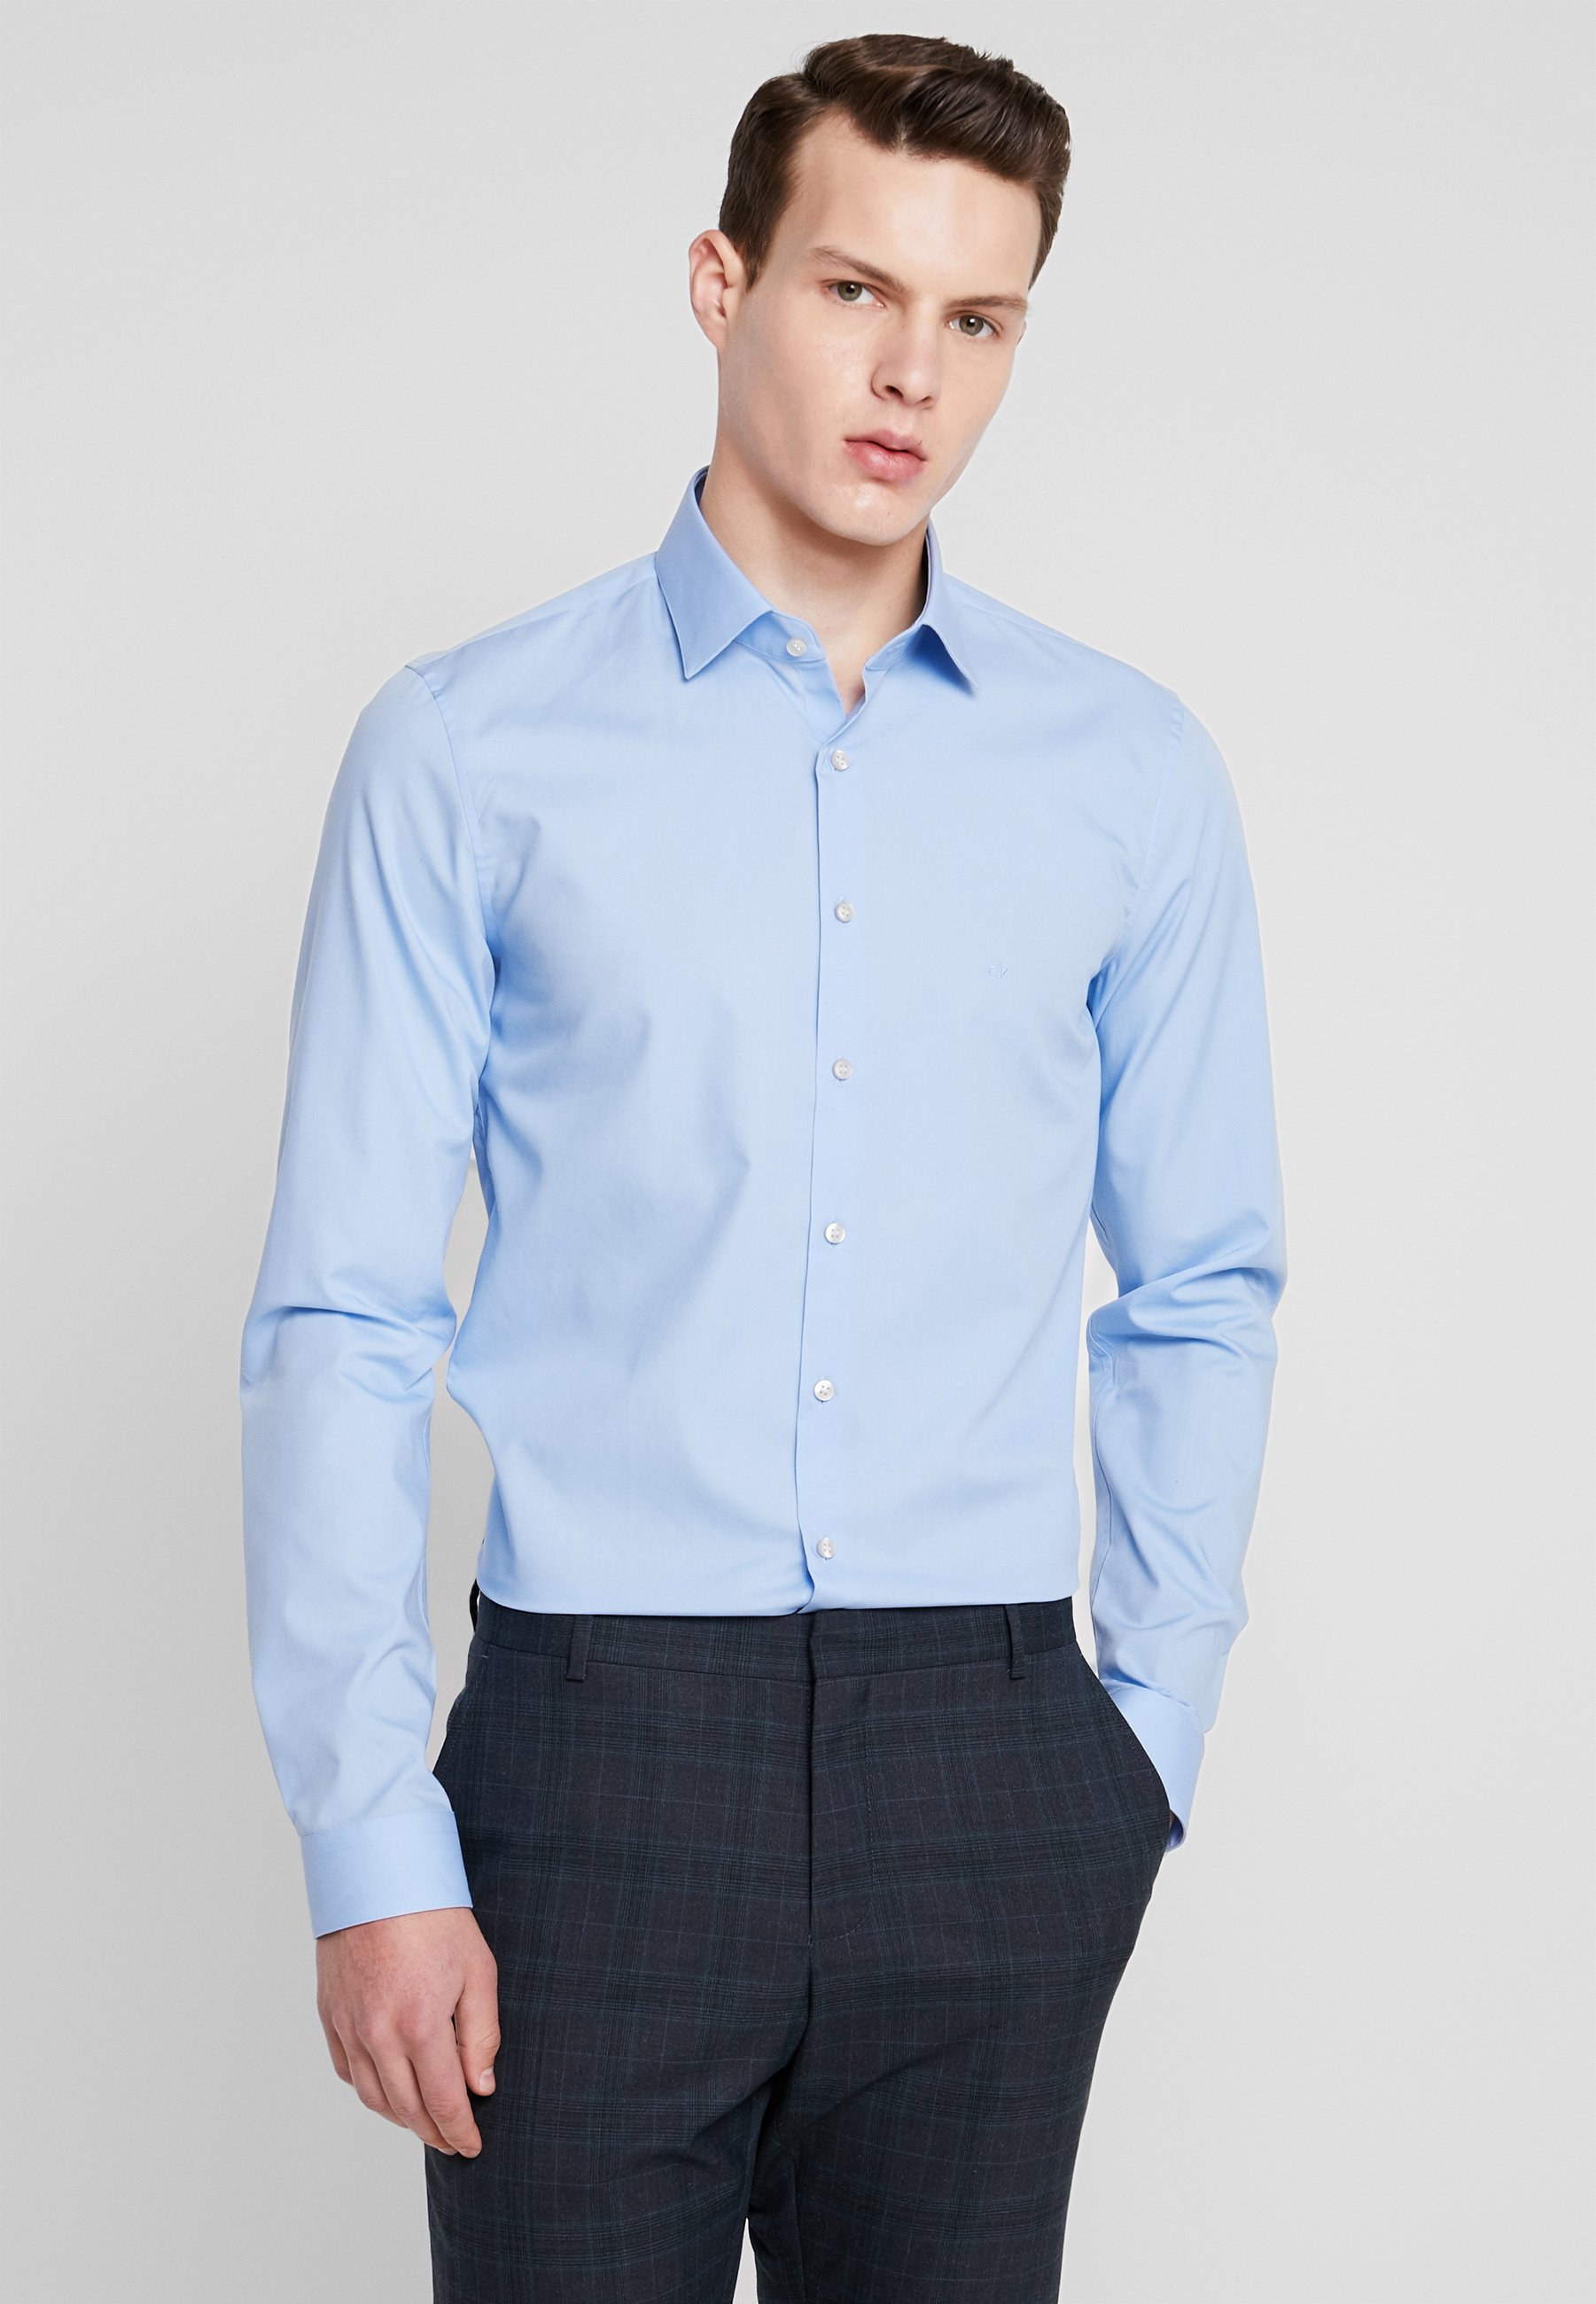 Calvin Classique Slim Tailored Klein Poplin Blue Extra FitChemise 4A5jLR